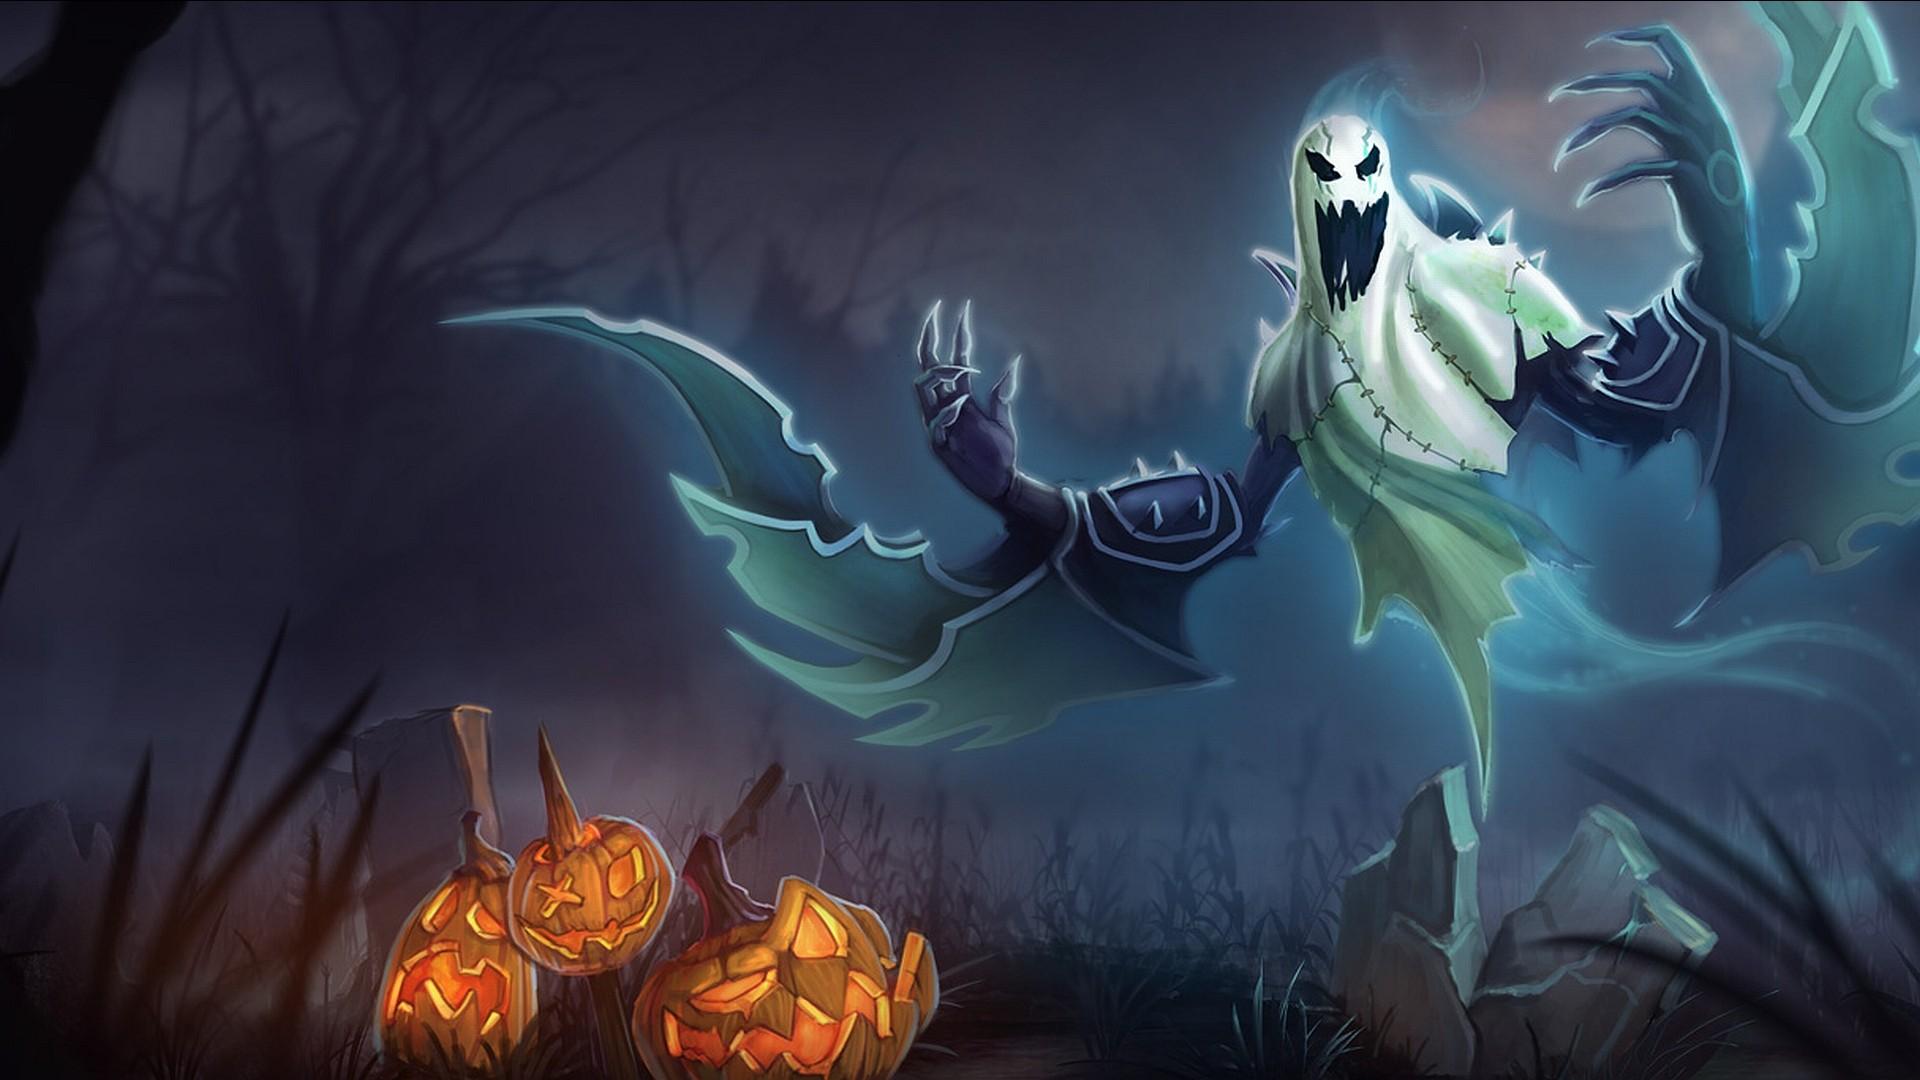 halloween wallpapers ghost - hd desktop wallpapers | 4k hd